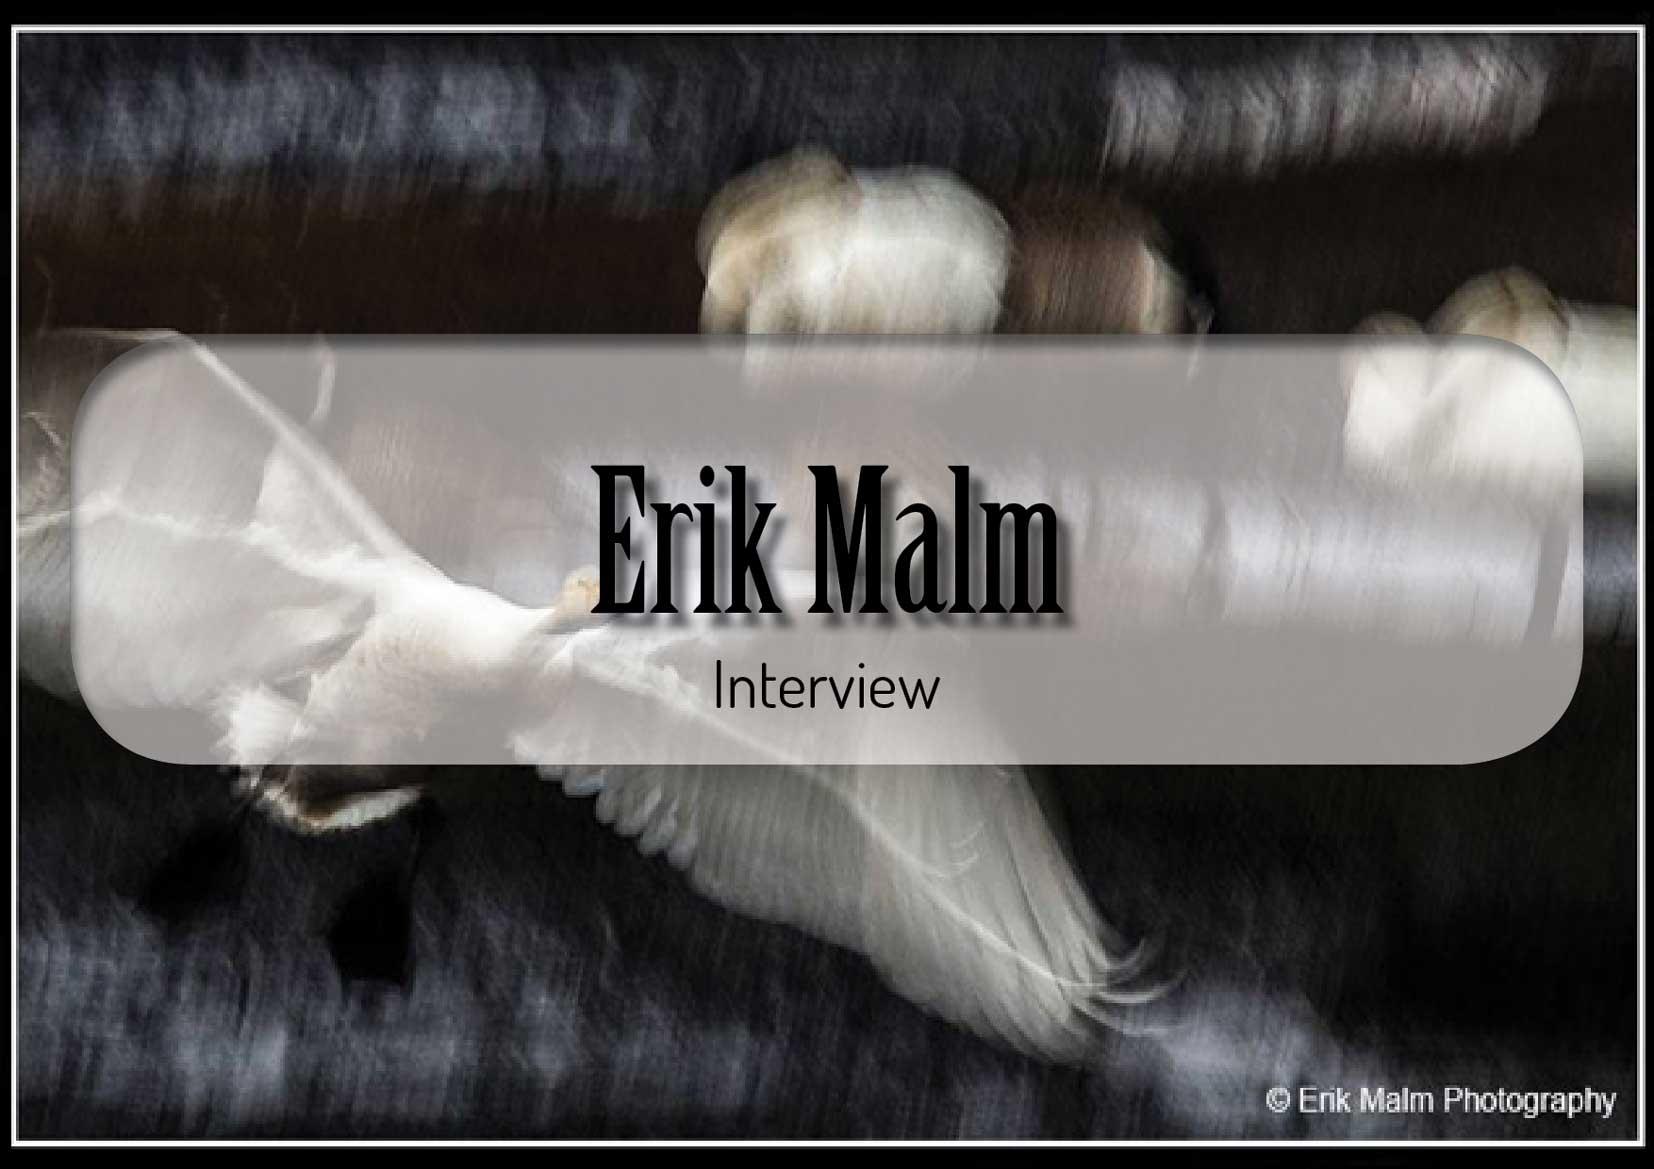 eric malm interview